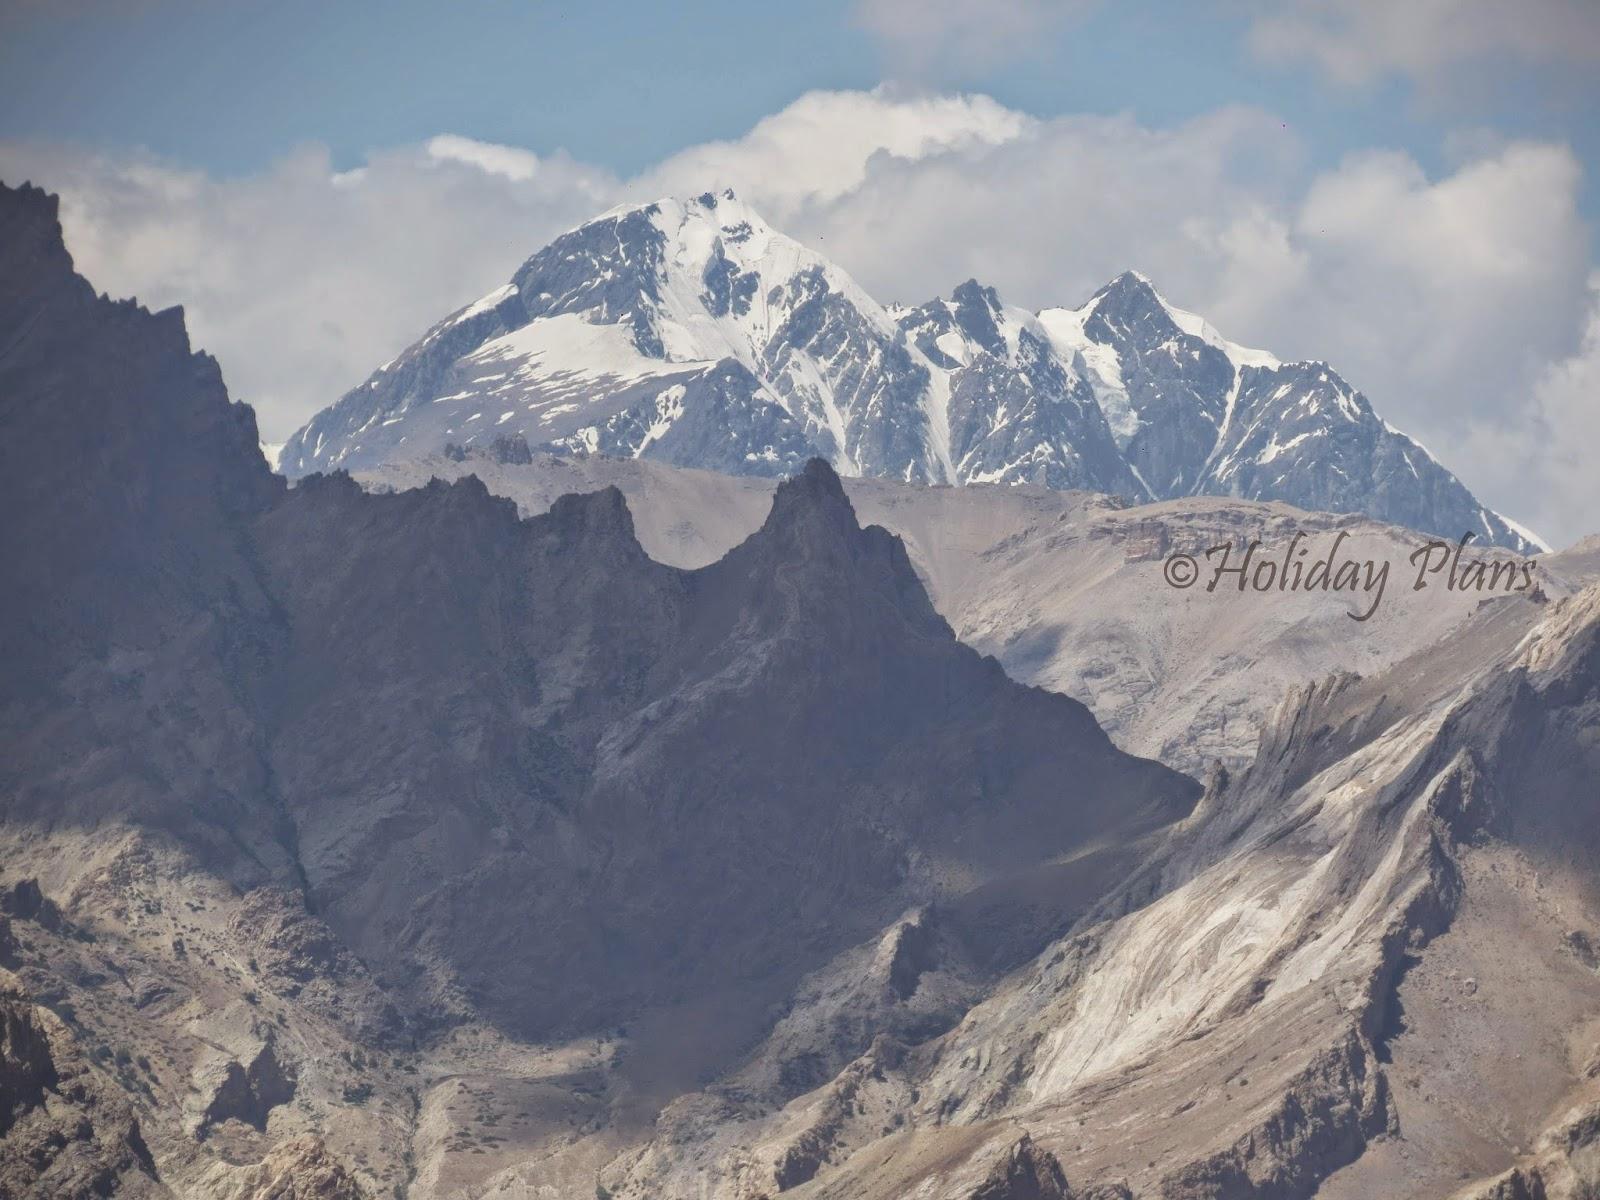 Himalayan snow peaks